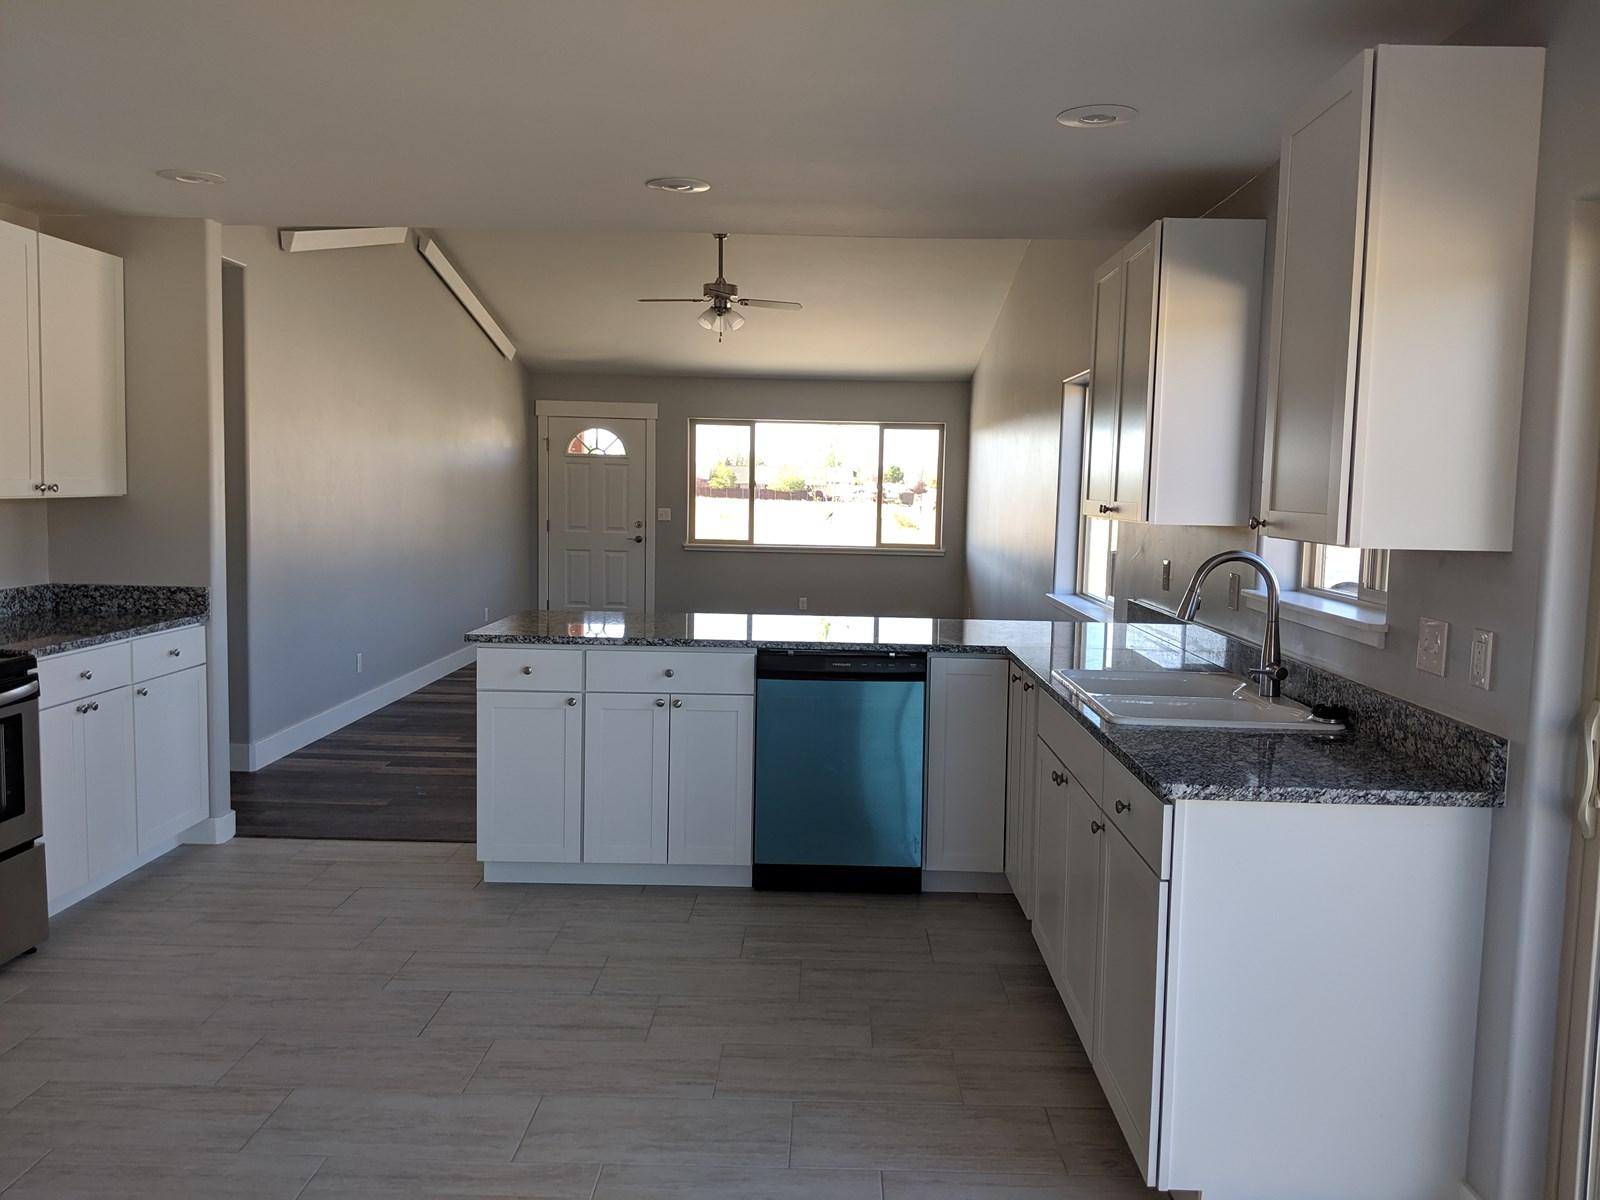 Colorado Mountain Affordable Living For Sale in Buena Vista